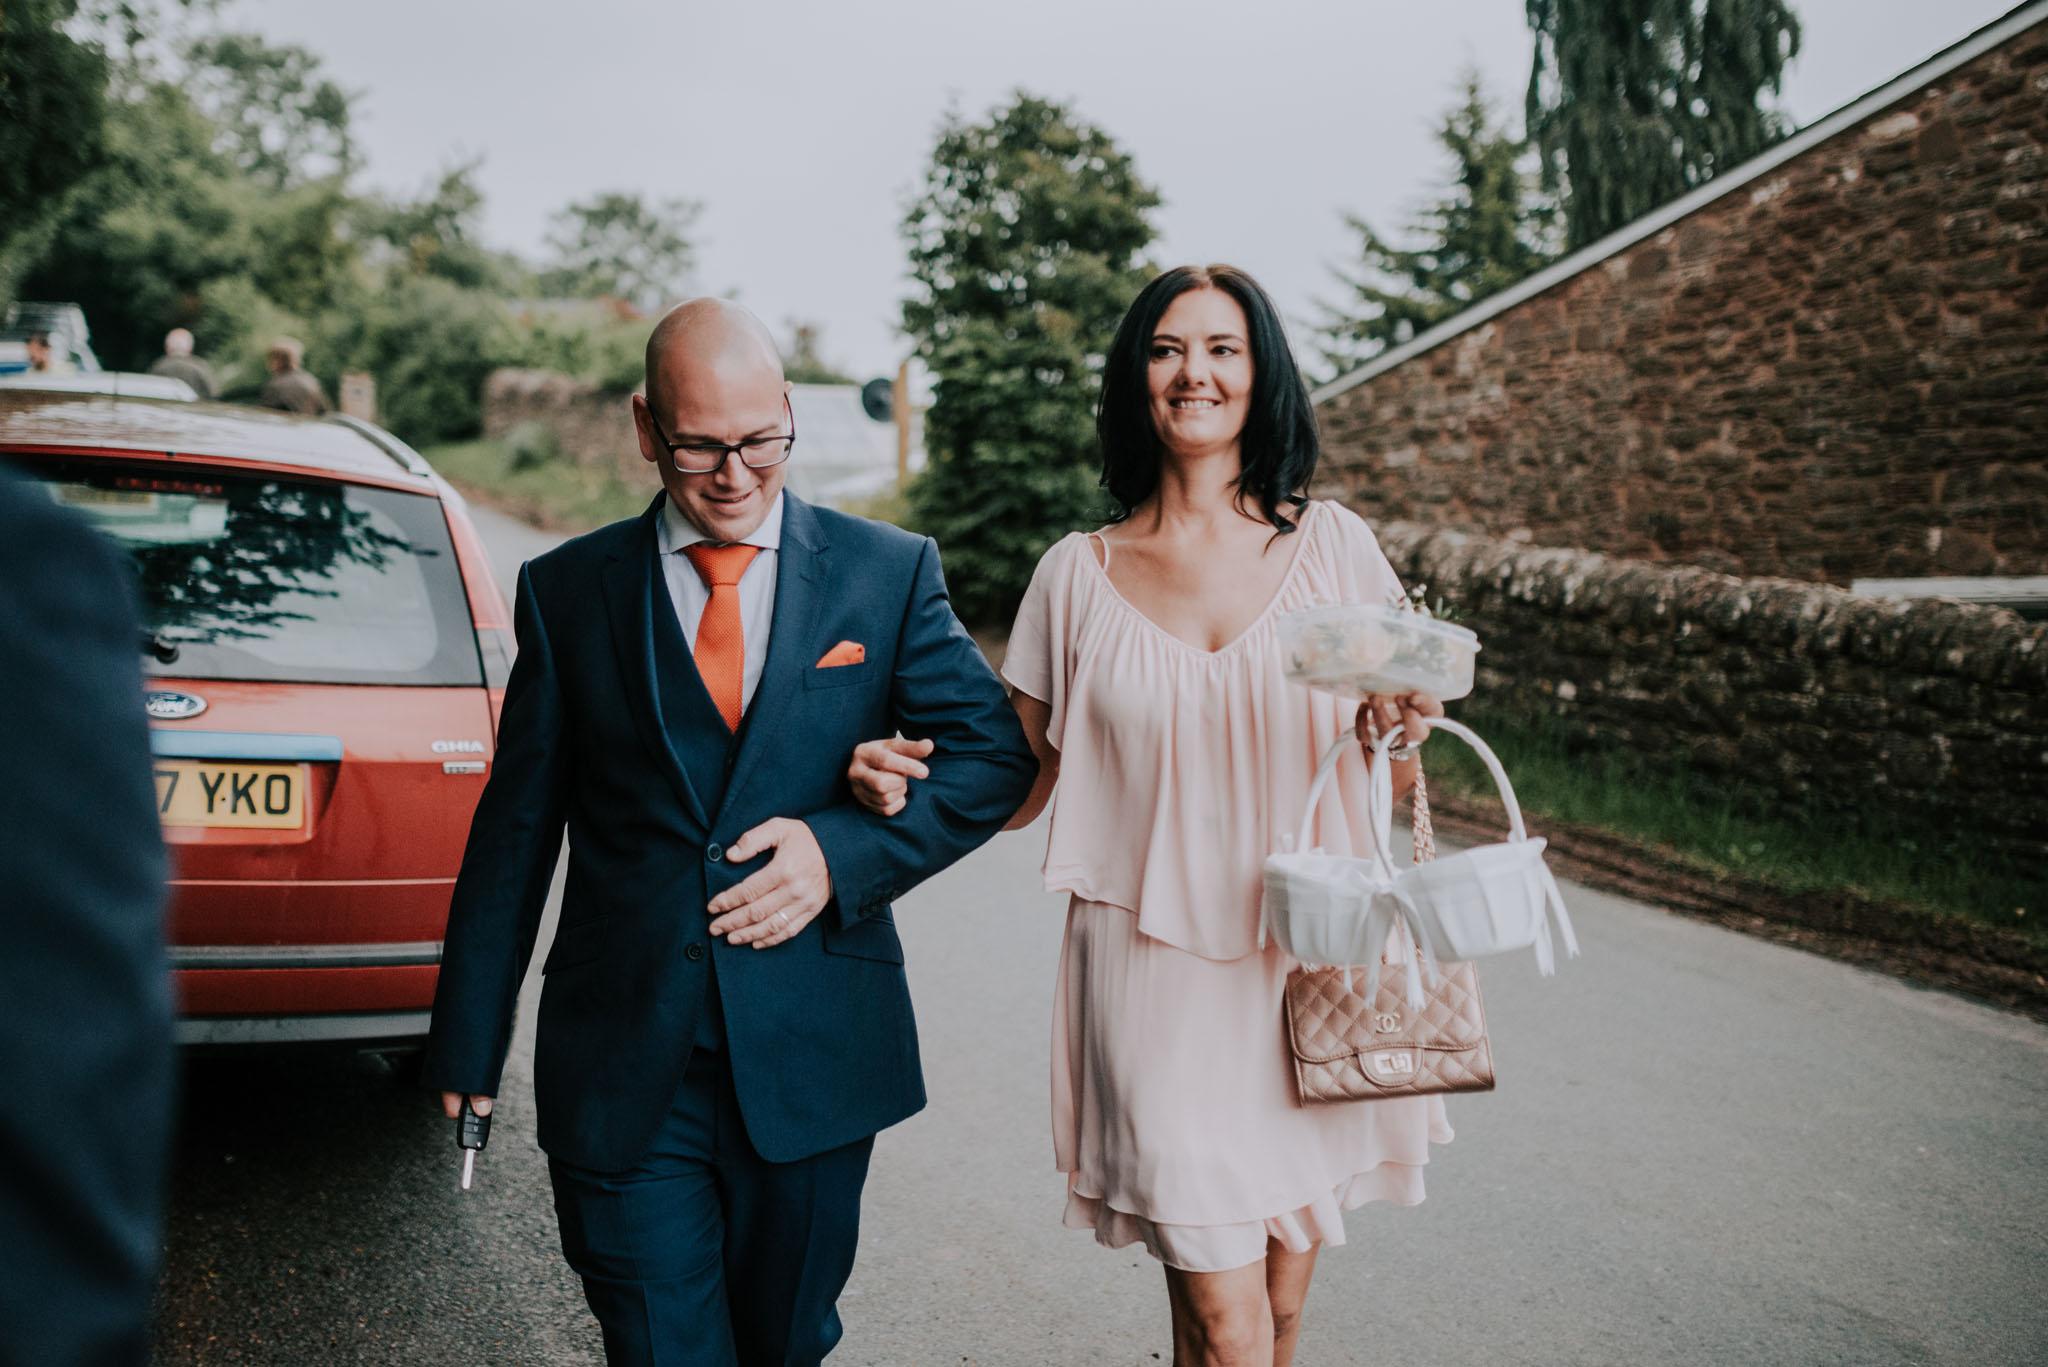 wedding-photographer-glewstone-court-hereford-scott-stockwell-photography119.jpg